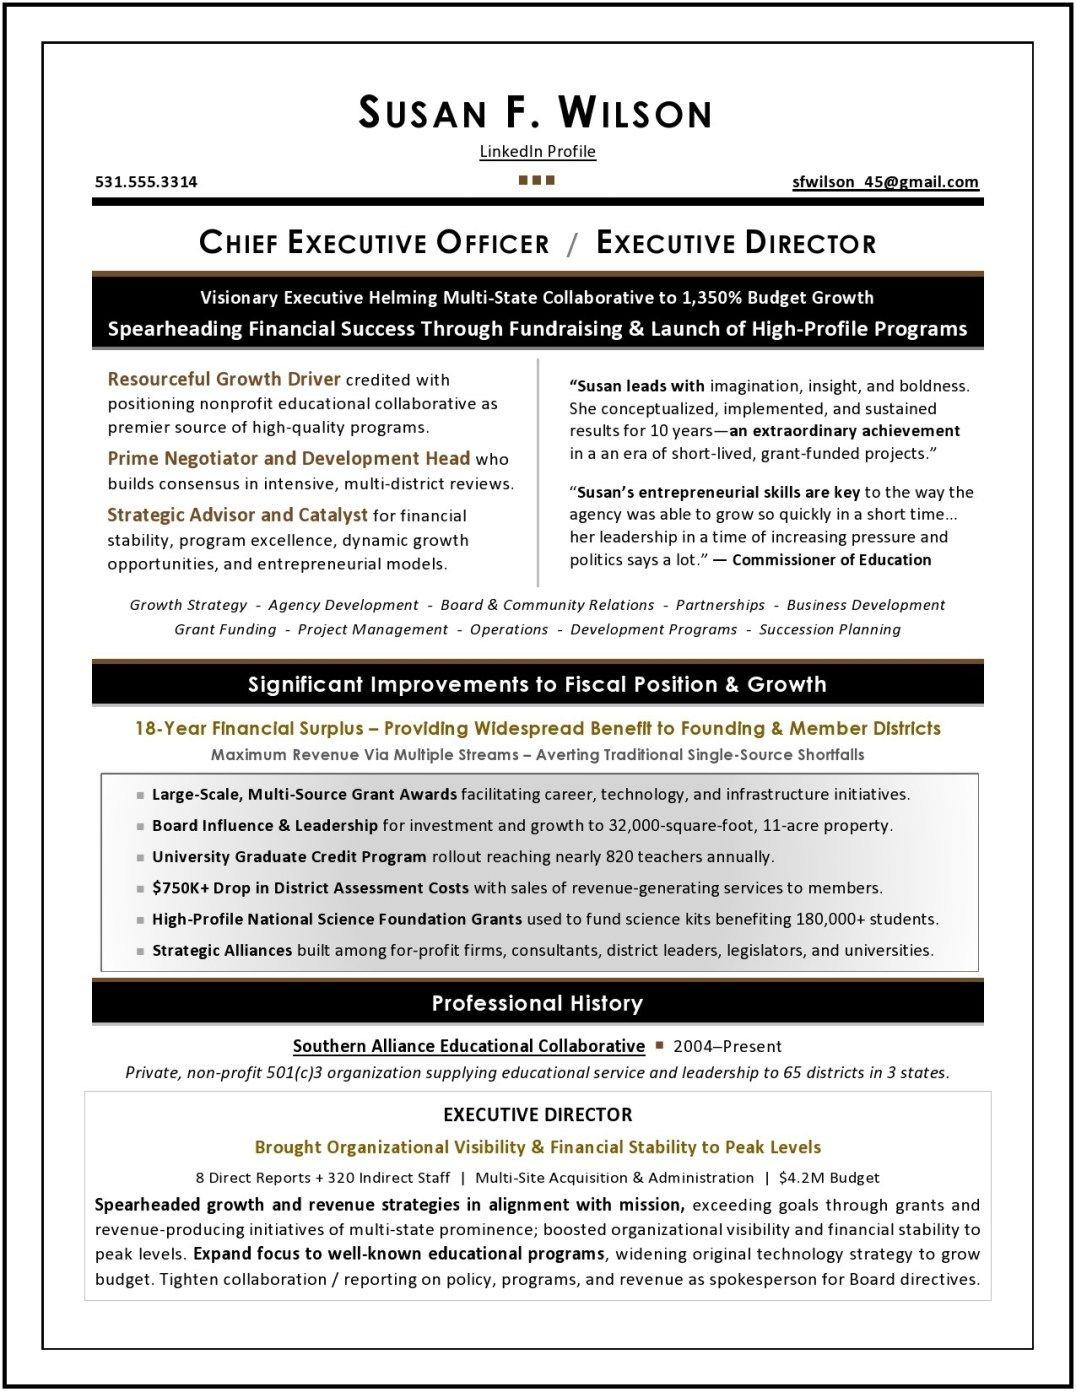 Nonprofit Ceo Resume Sample Executive Resume Professional Resume Writers Resume Writing Services